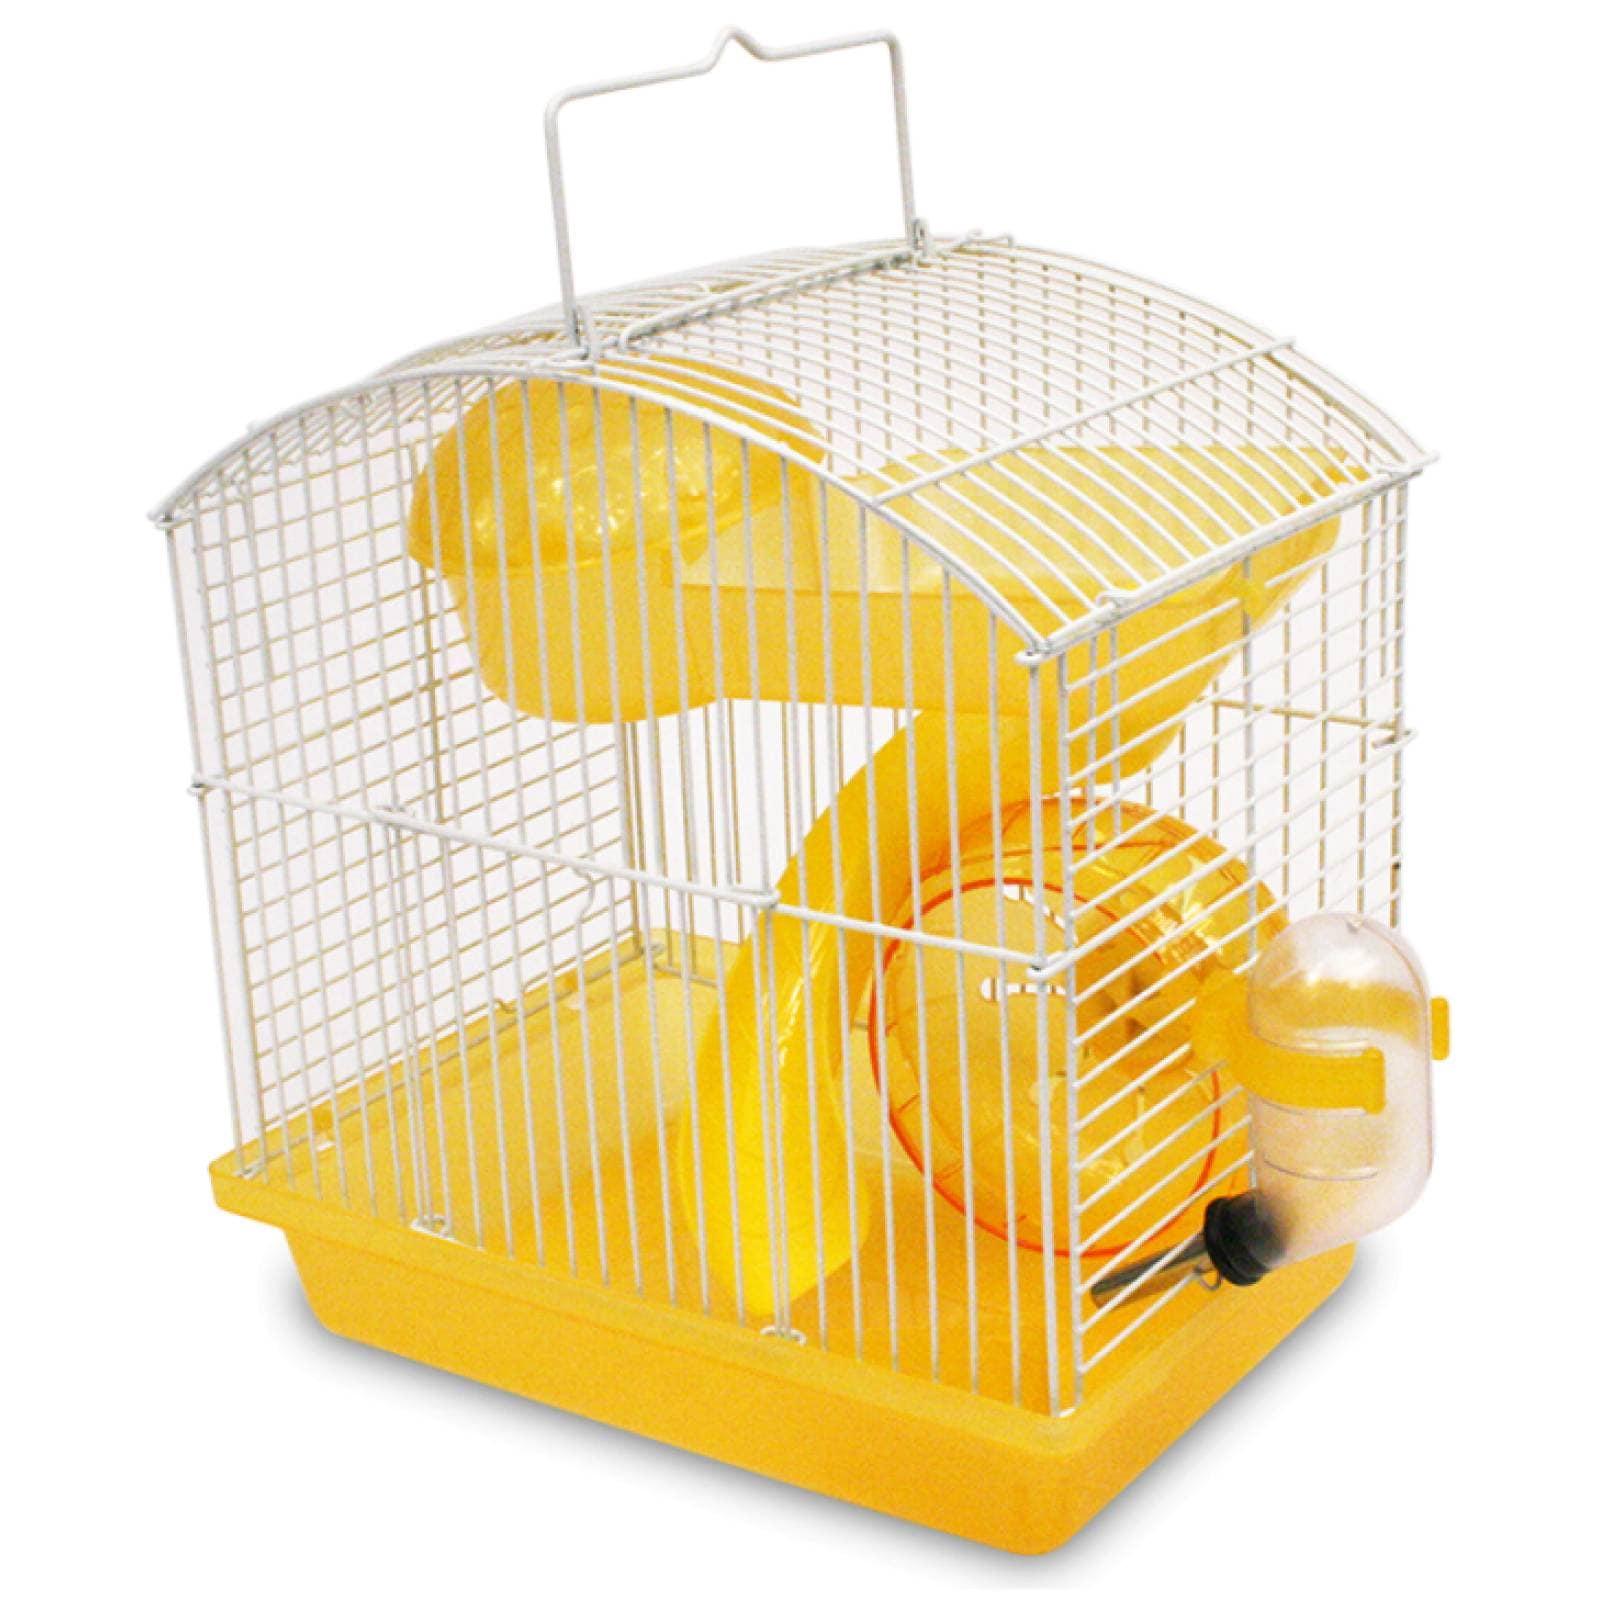 Redkite Jaula San Francisco N para Hamster